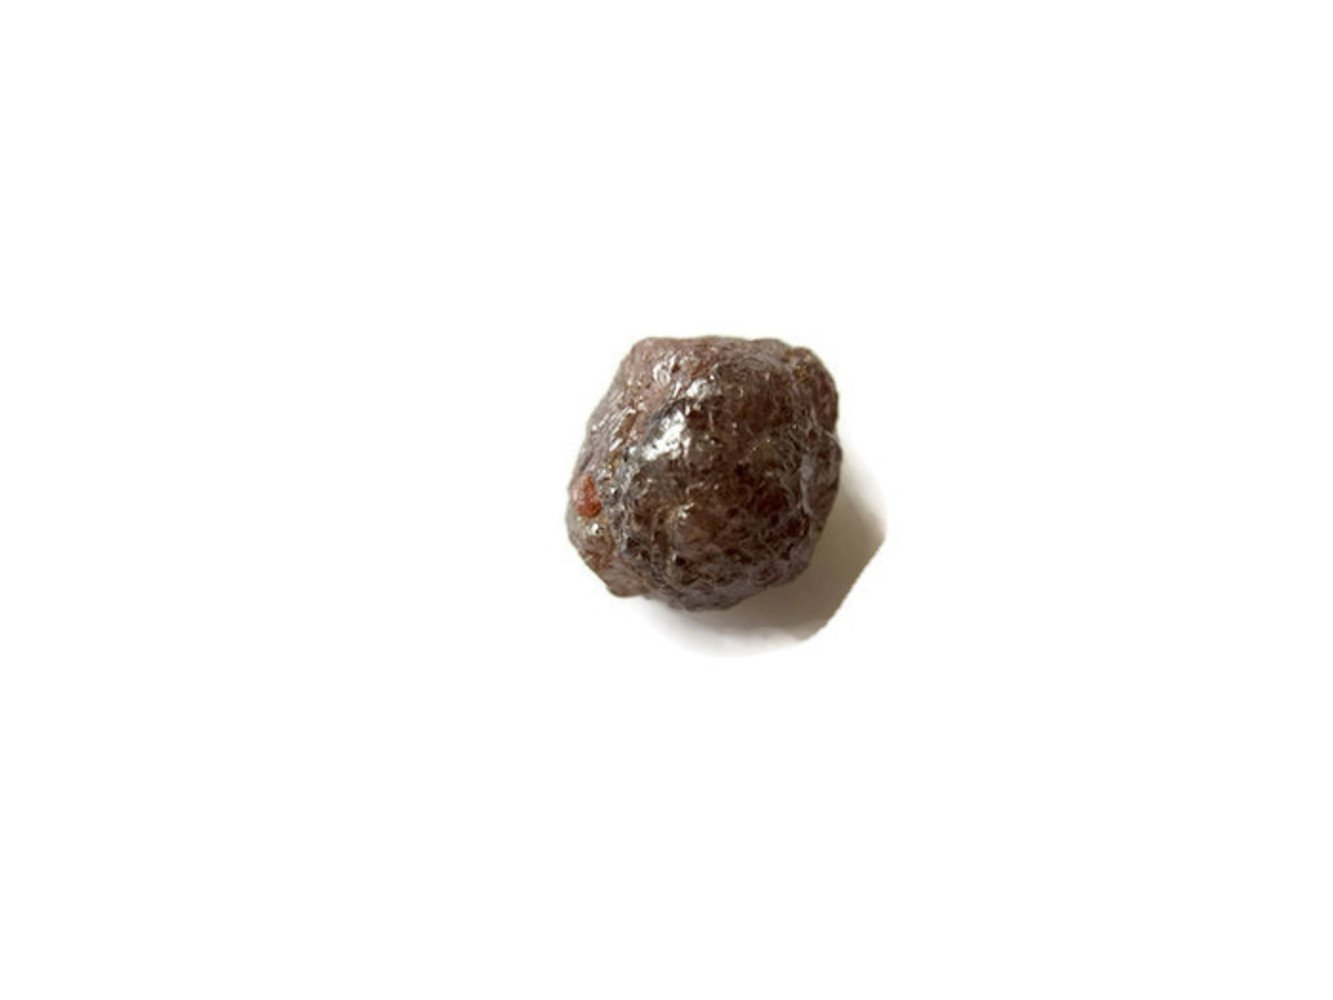 9.7x9.4x9.5mm 7.15CTW OOAK Natural Red Rough Diamond Loose, Natural Uncut Diamond Loose -DDS494/16